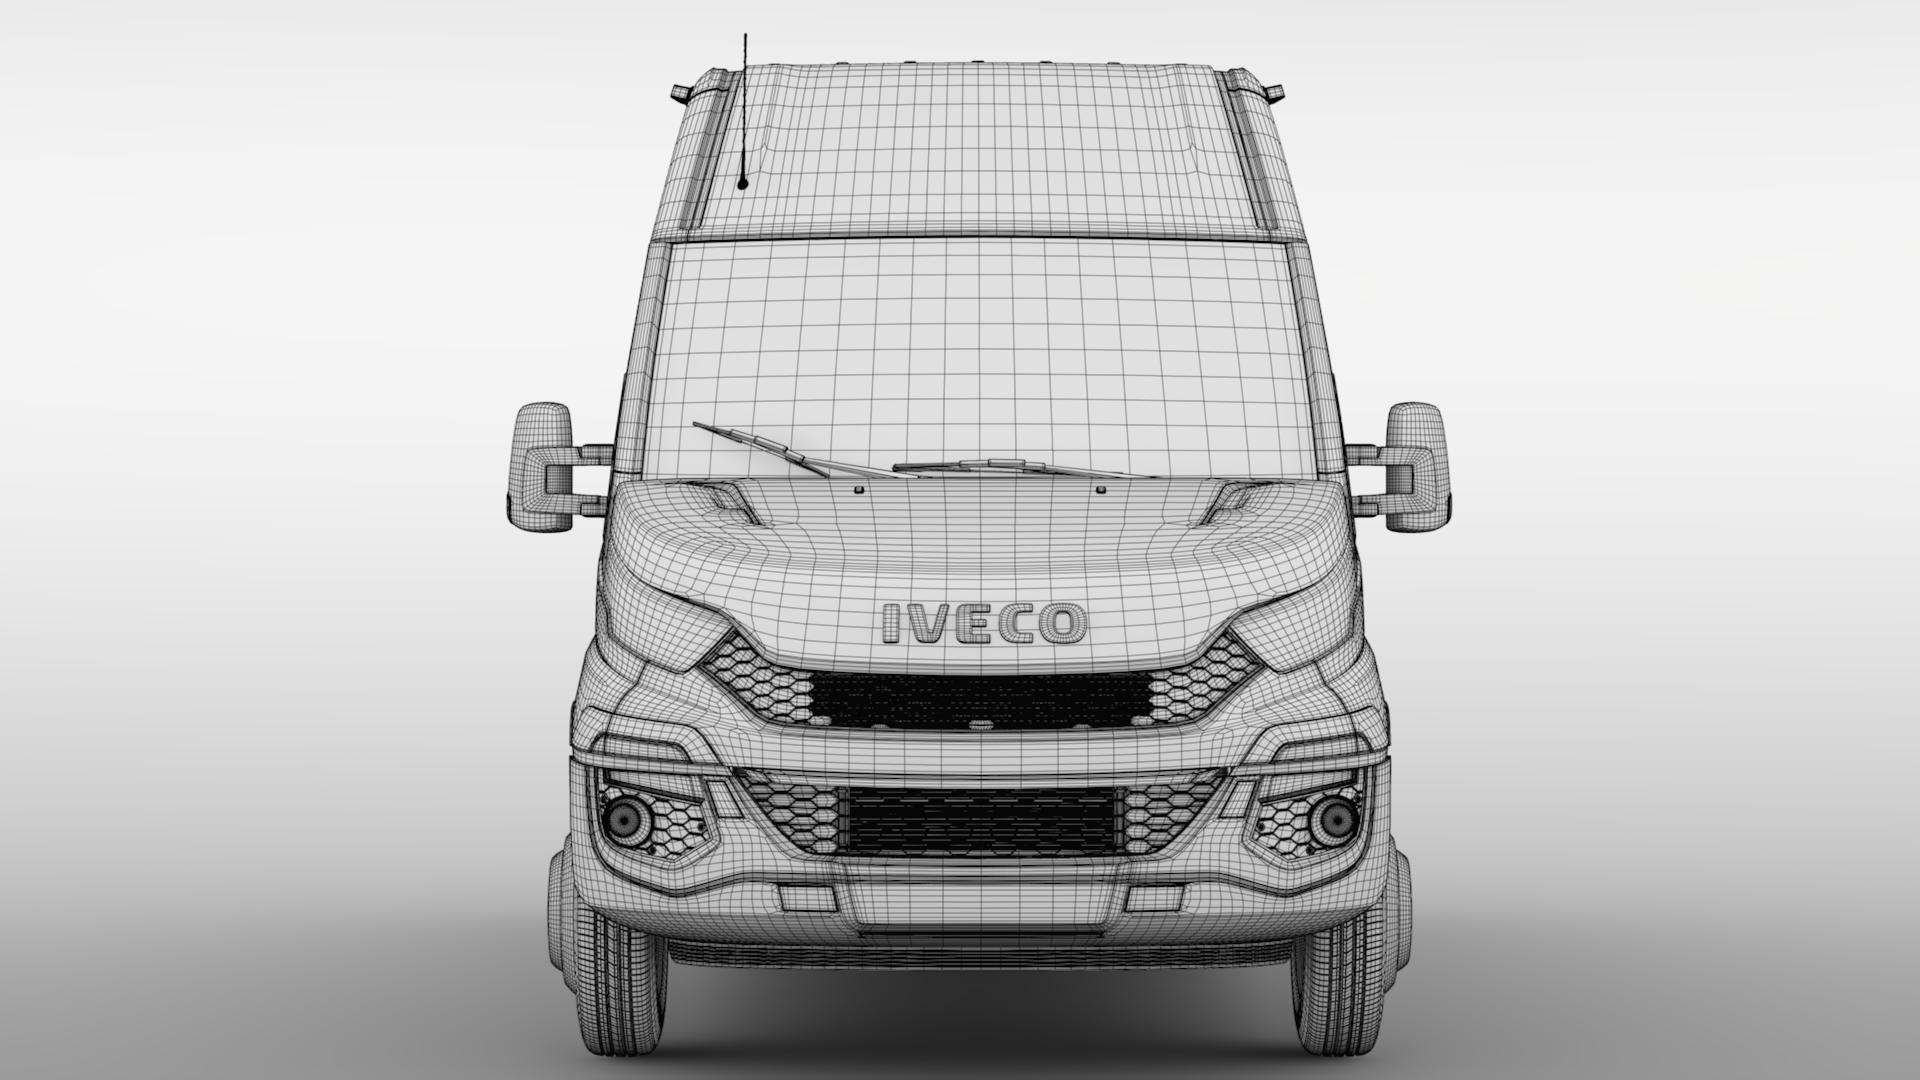 iveco daily minibus l3h2 2014-2016 3d model max fbx c4d lwo ma mb hrc xsi obj 276056